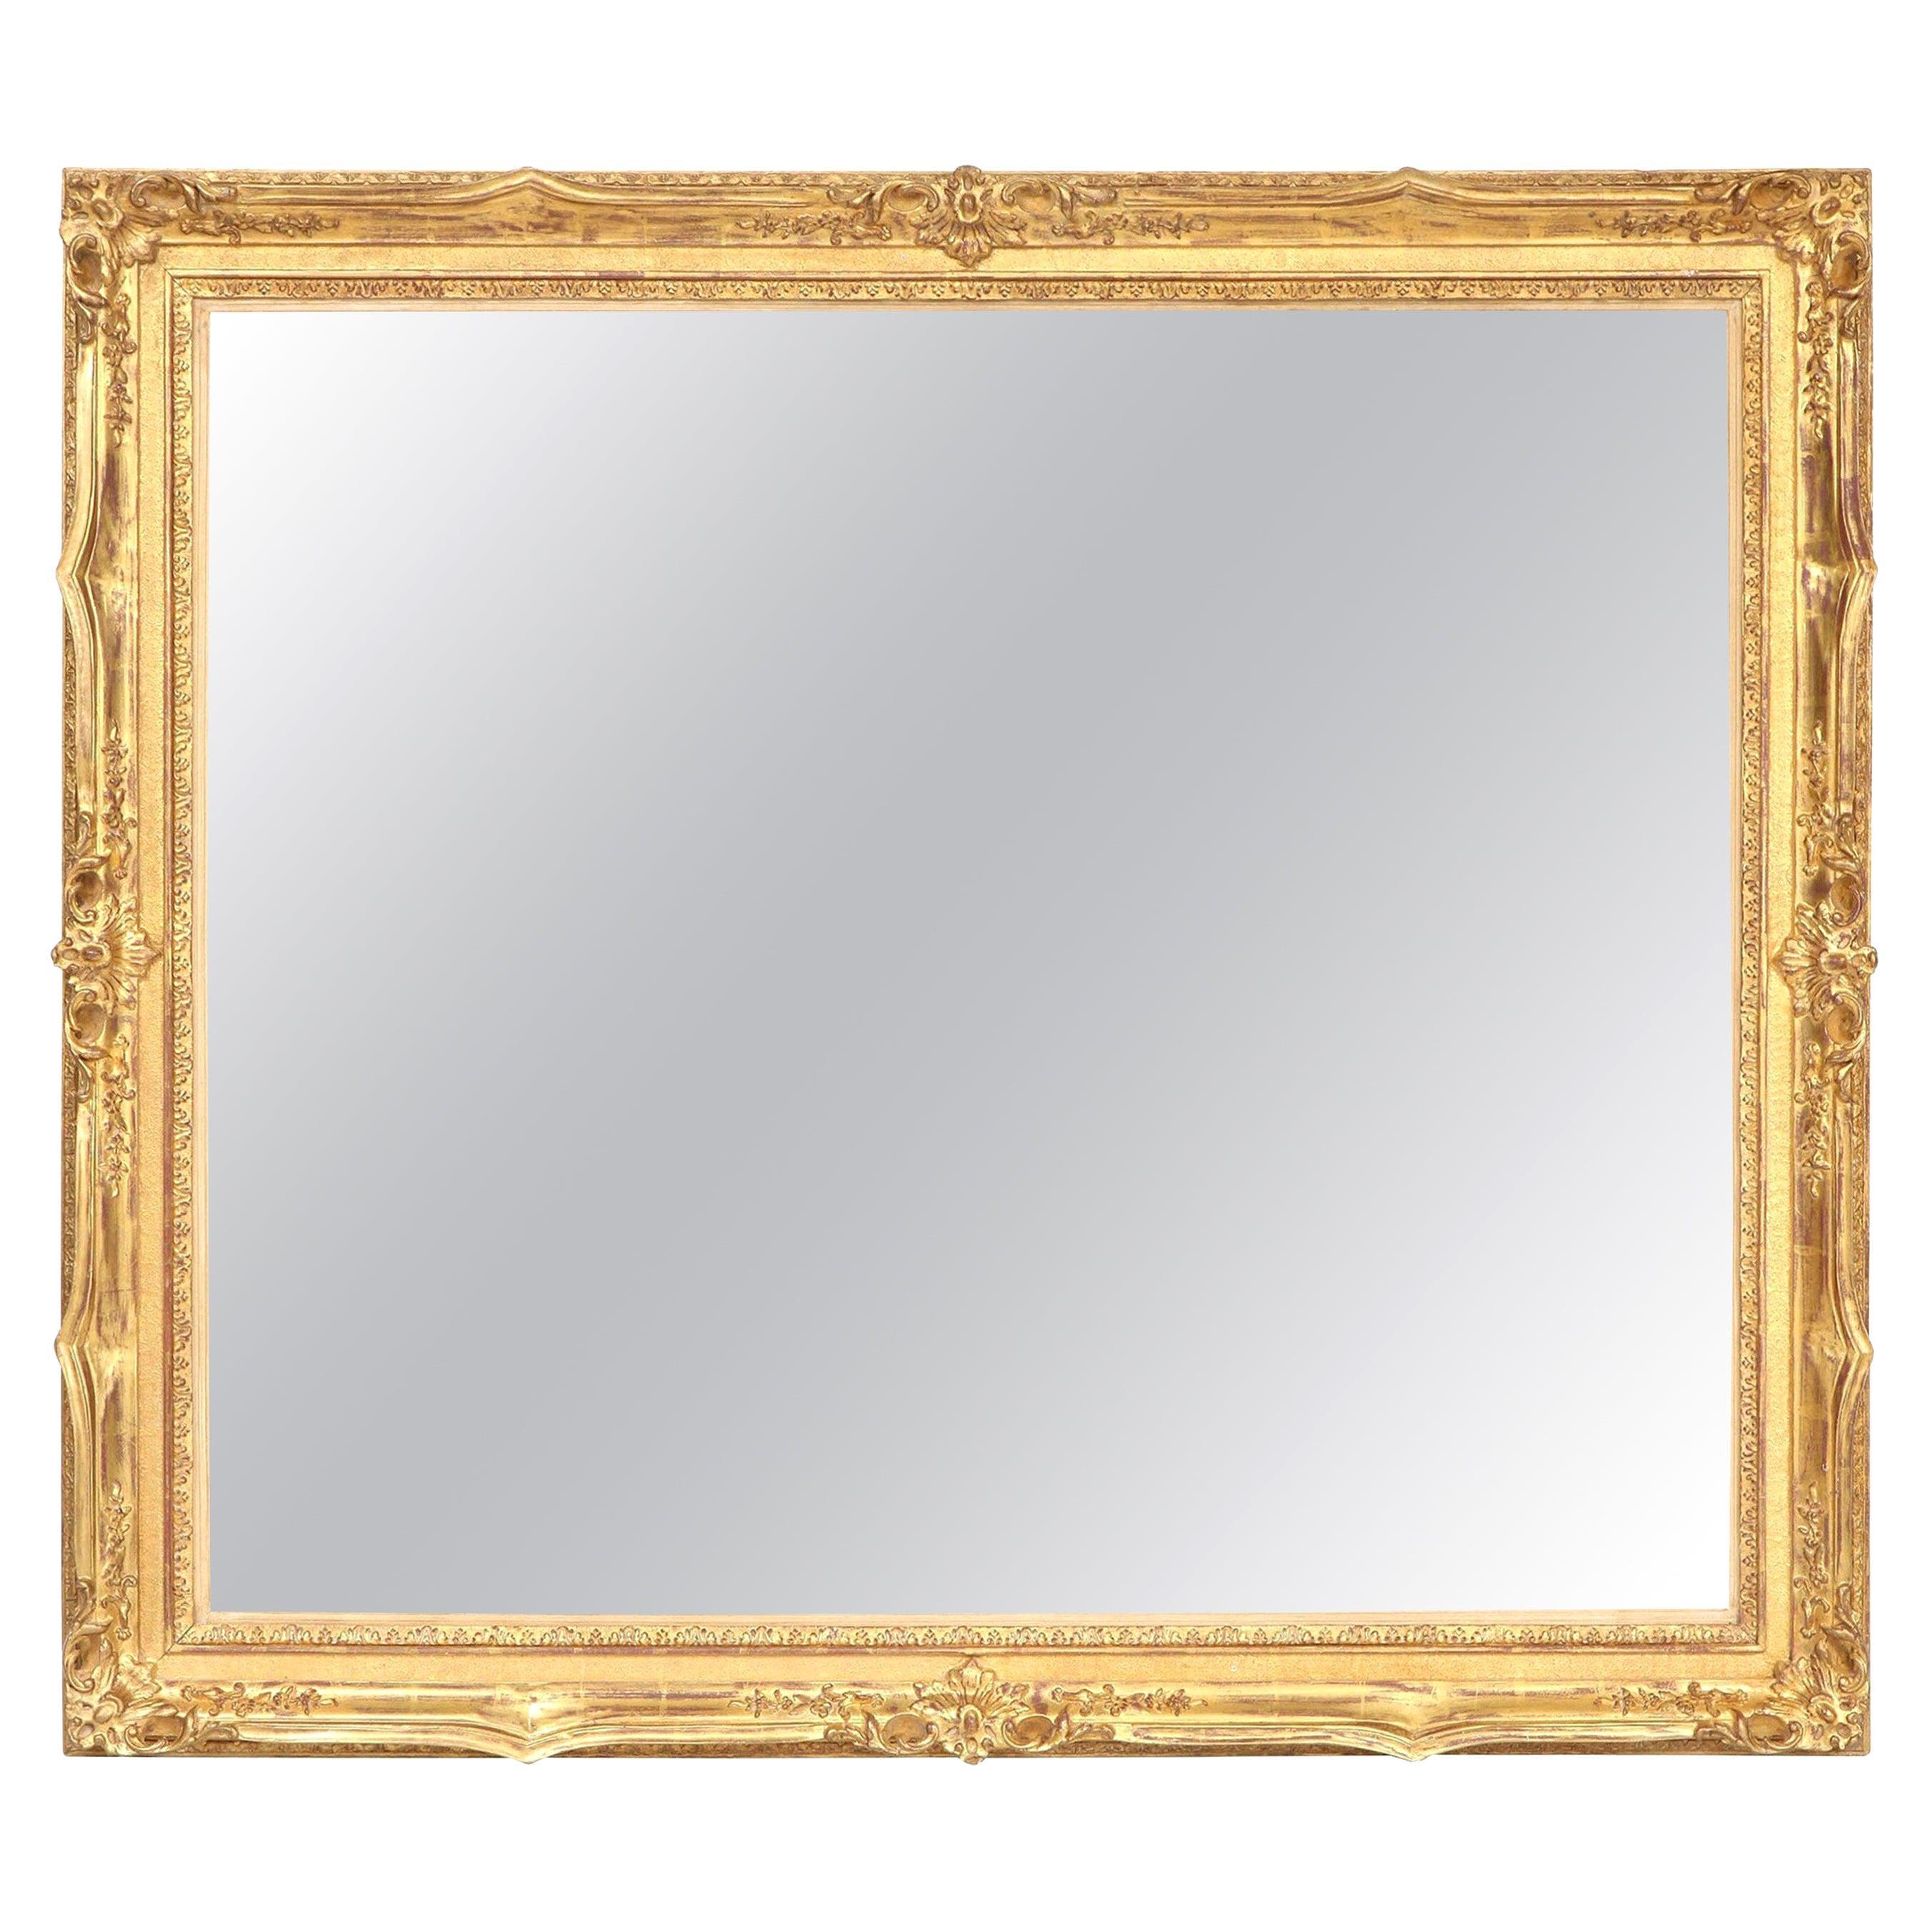 Mirror, Decorative, Antique Wall Mirror, circa 1950, Gold Leaf, Large Mirror